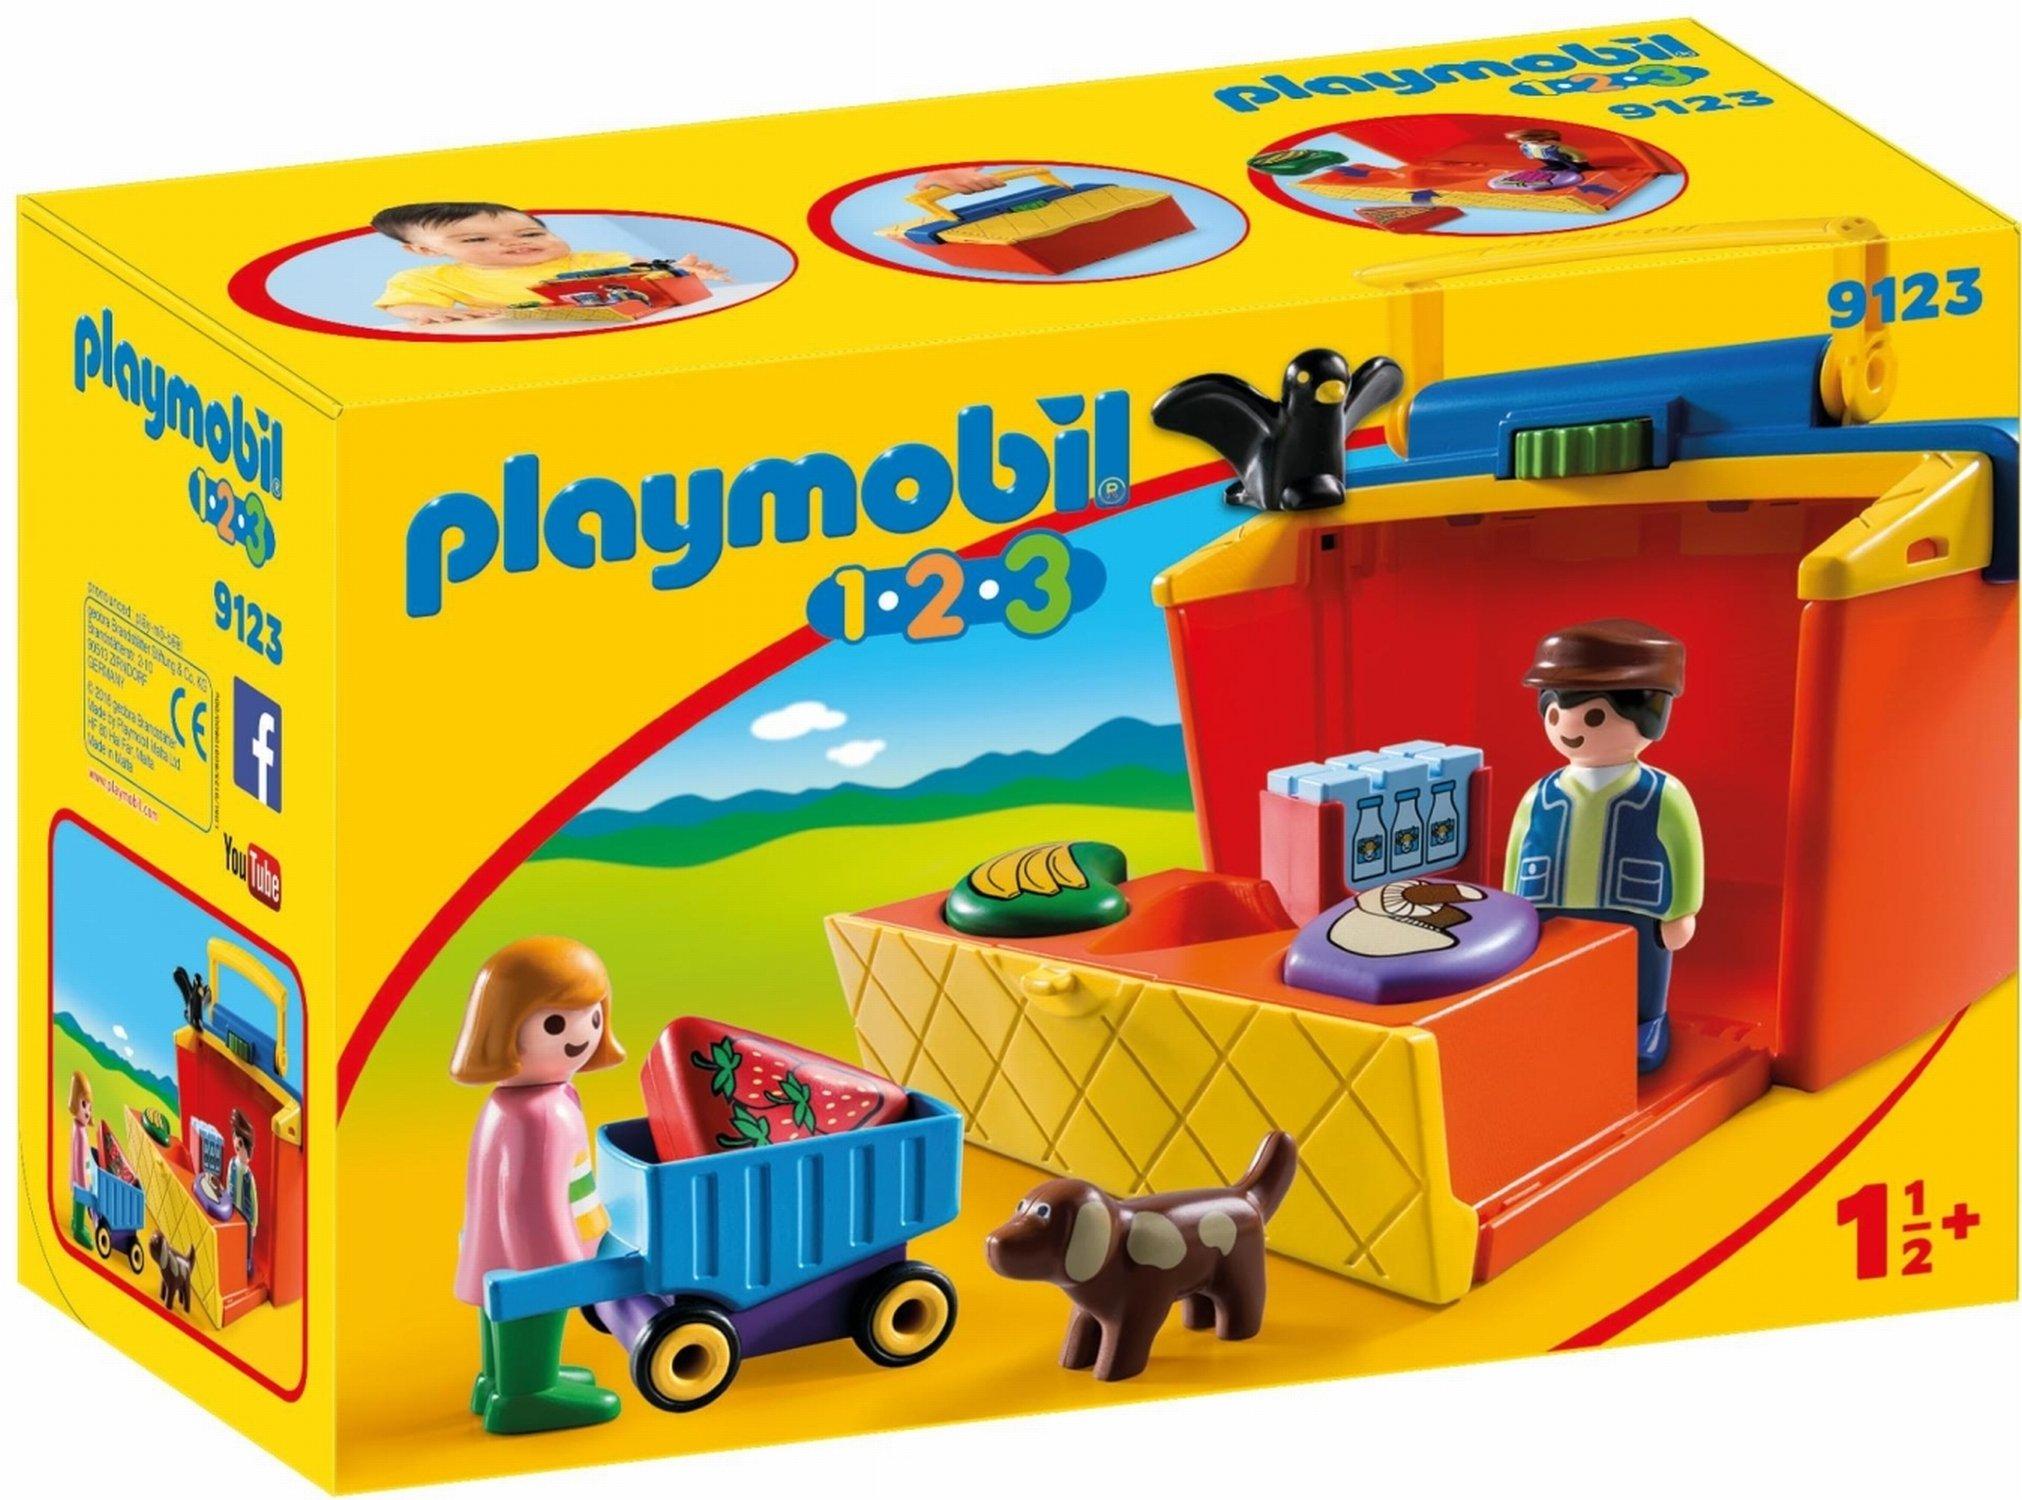 PLAYMOBIL® Take Along Market Stall Building Set